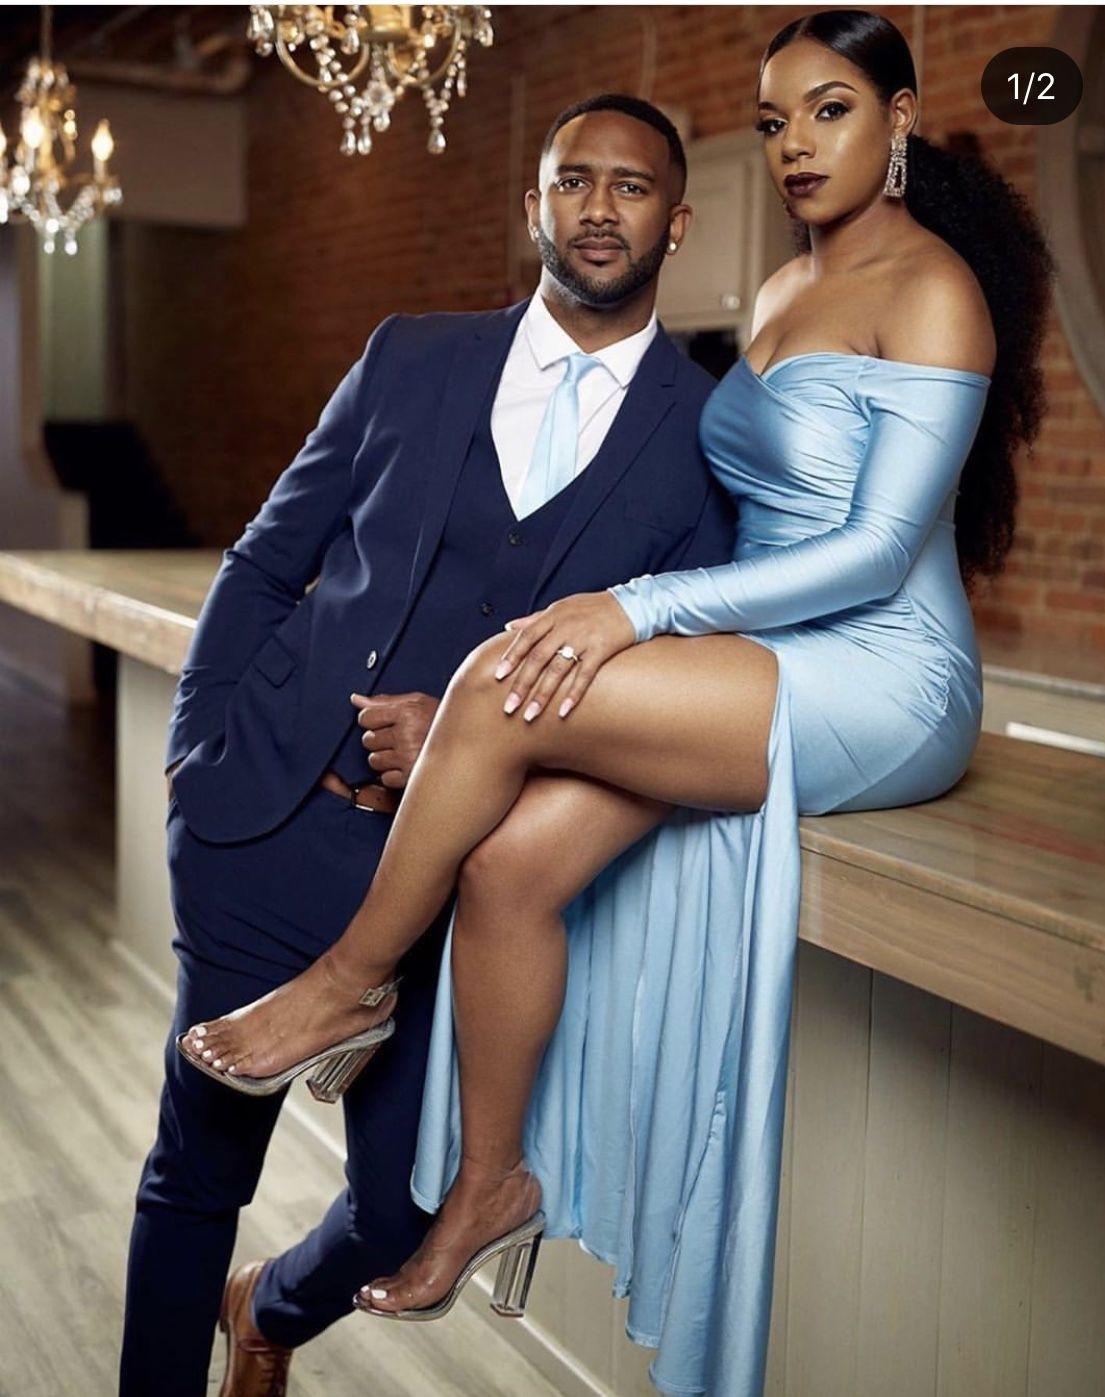 Black love, black engagement, melanin wedding, African